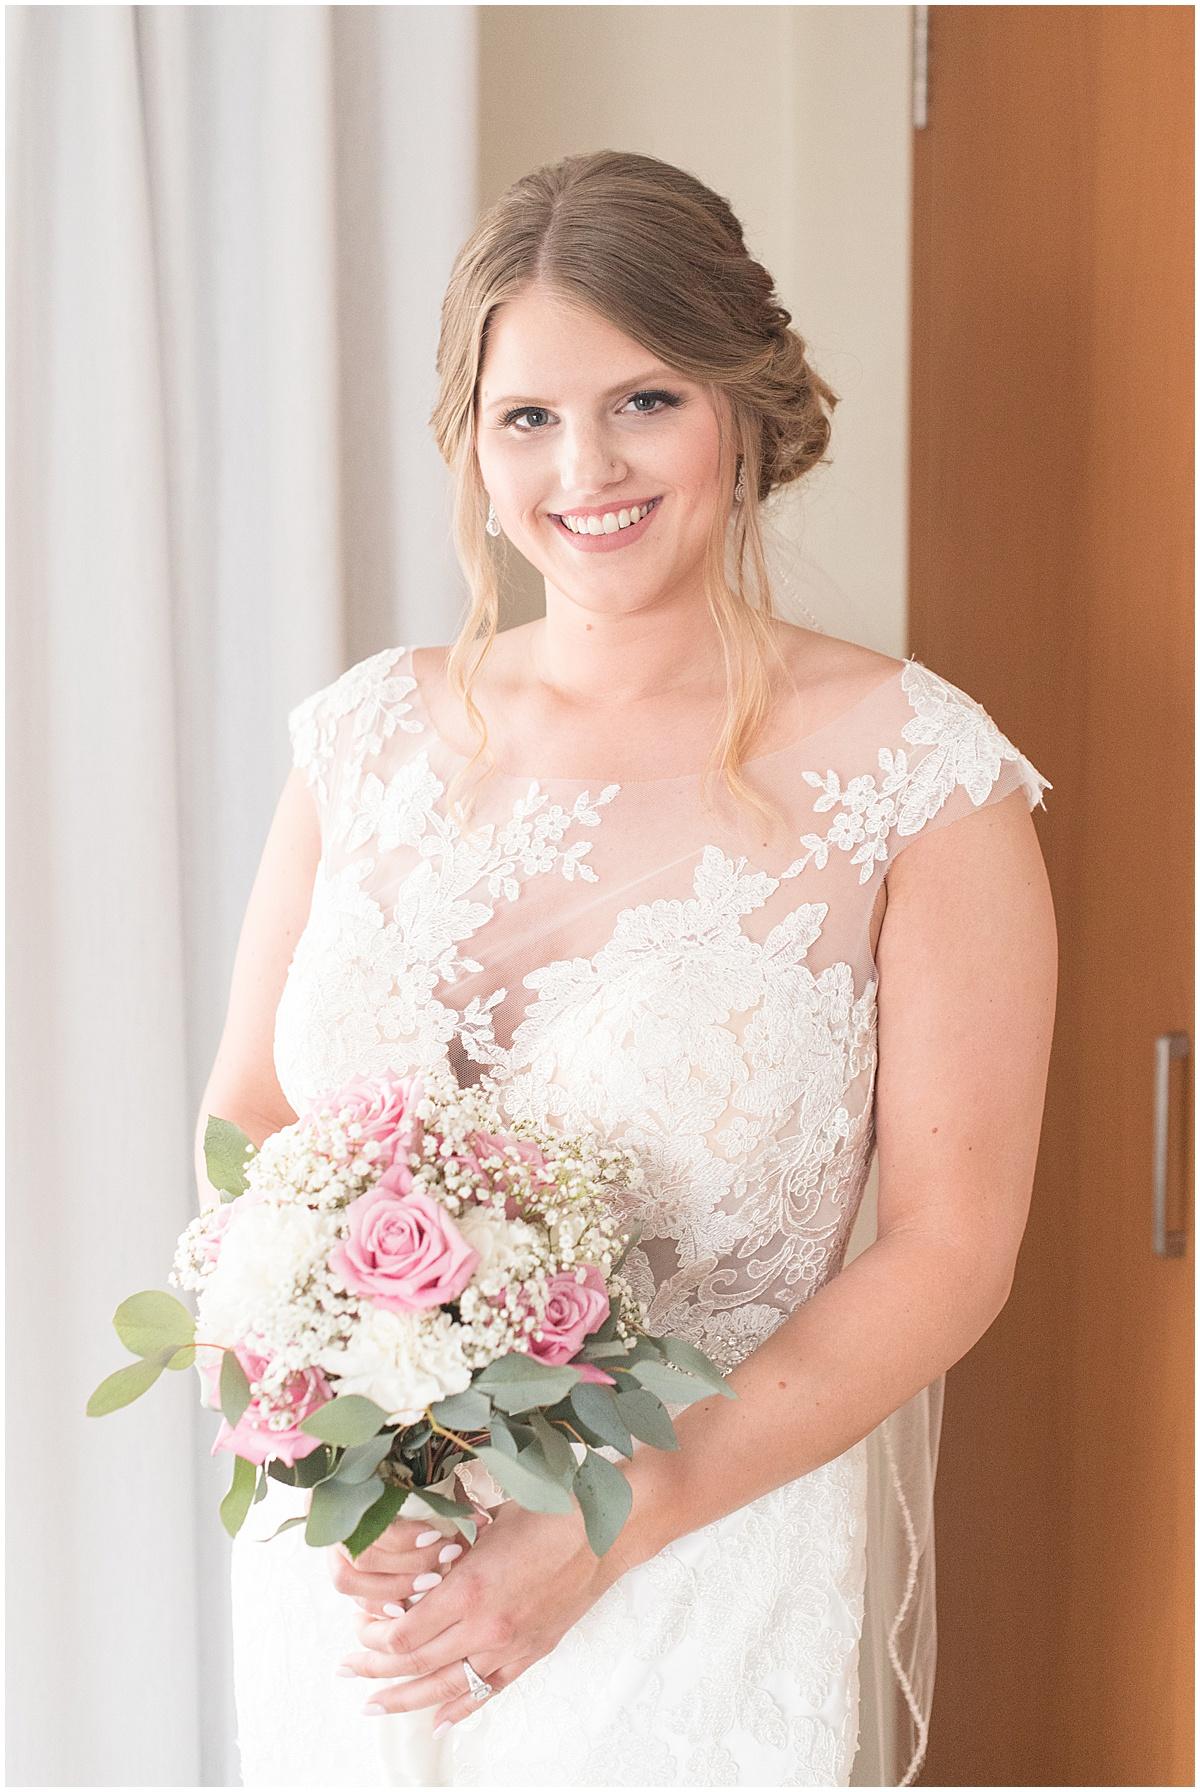 Anderson Wedding - Wedding in Berwyn Illinois 27.jpg